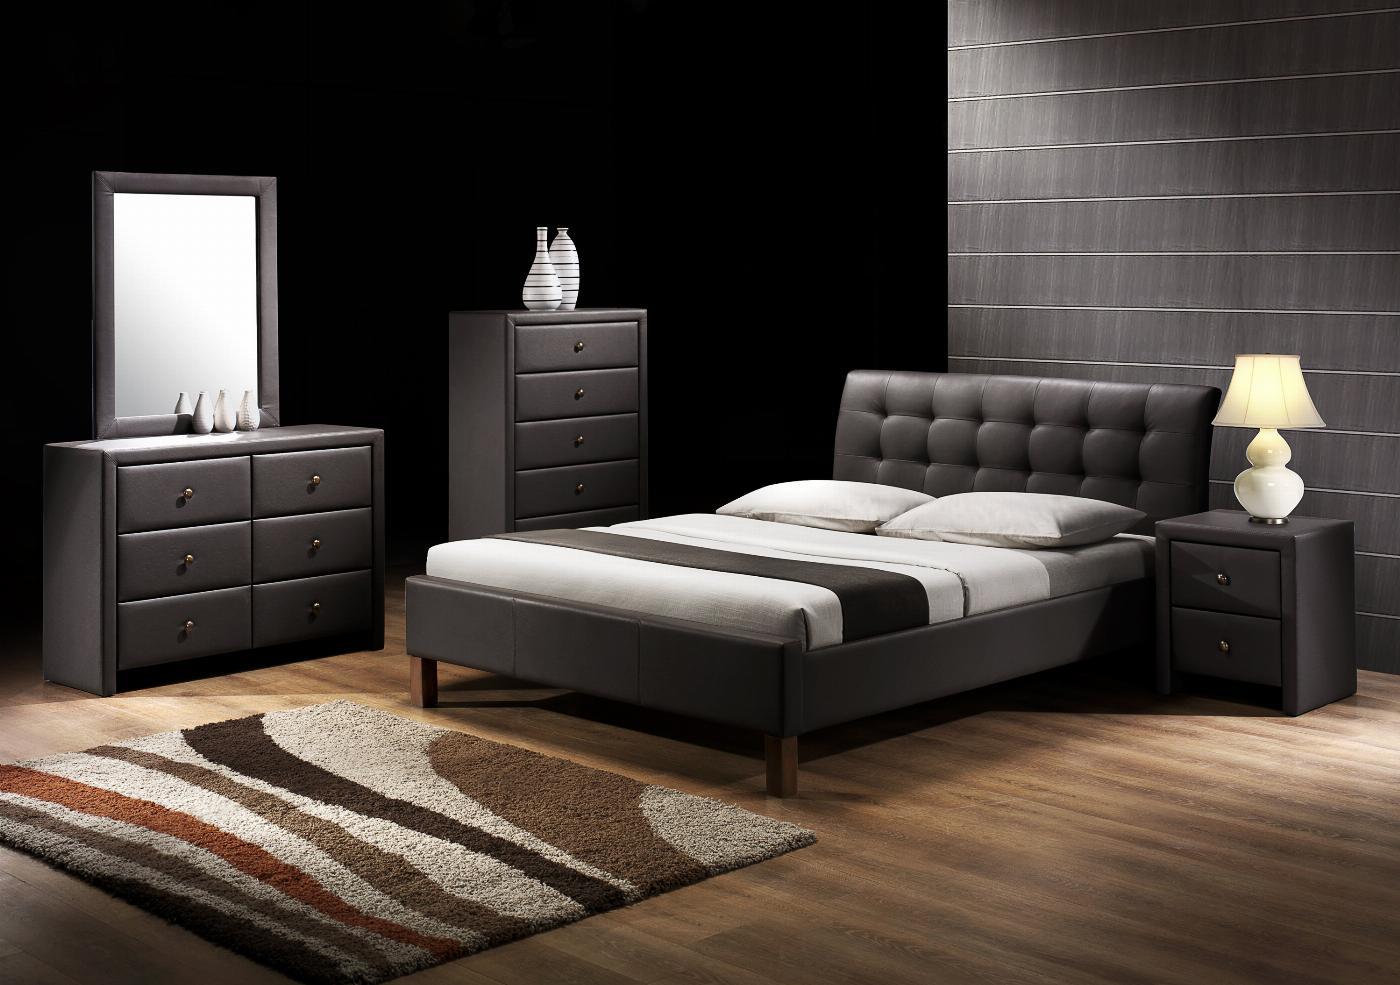 SAMARA 160 łóżko czarny (2p=1szt.)